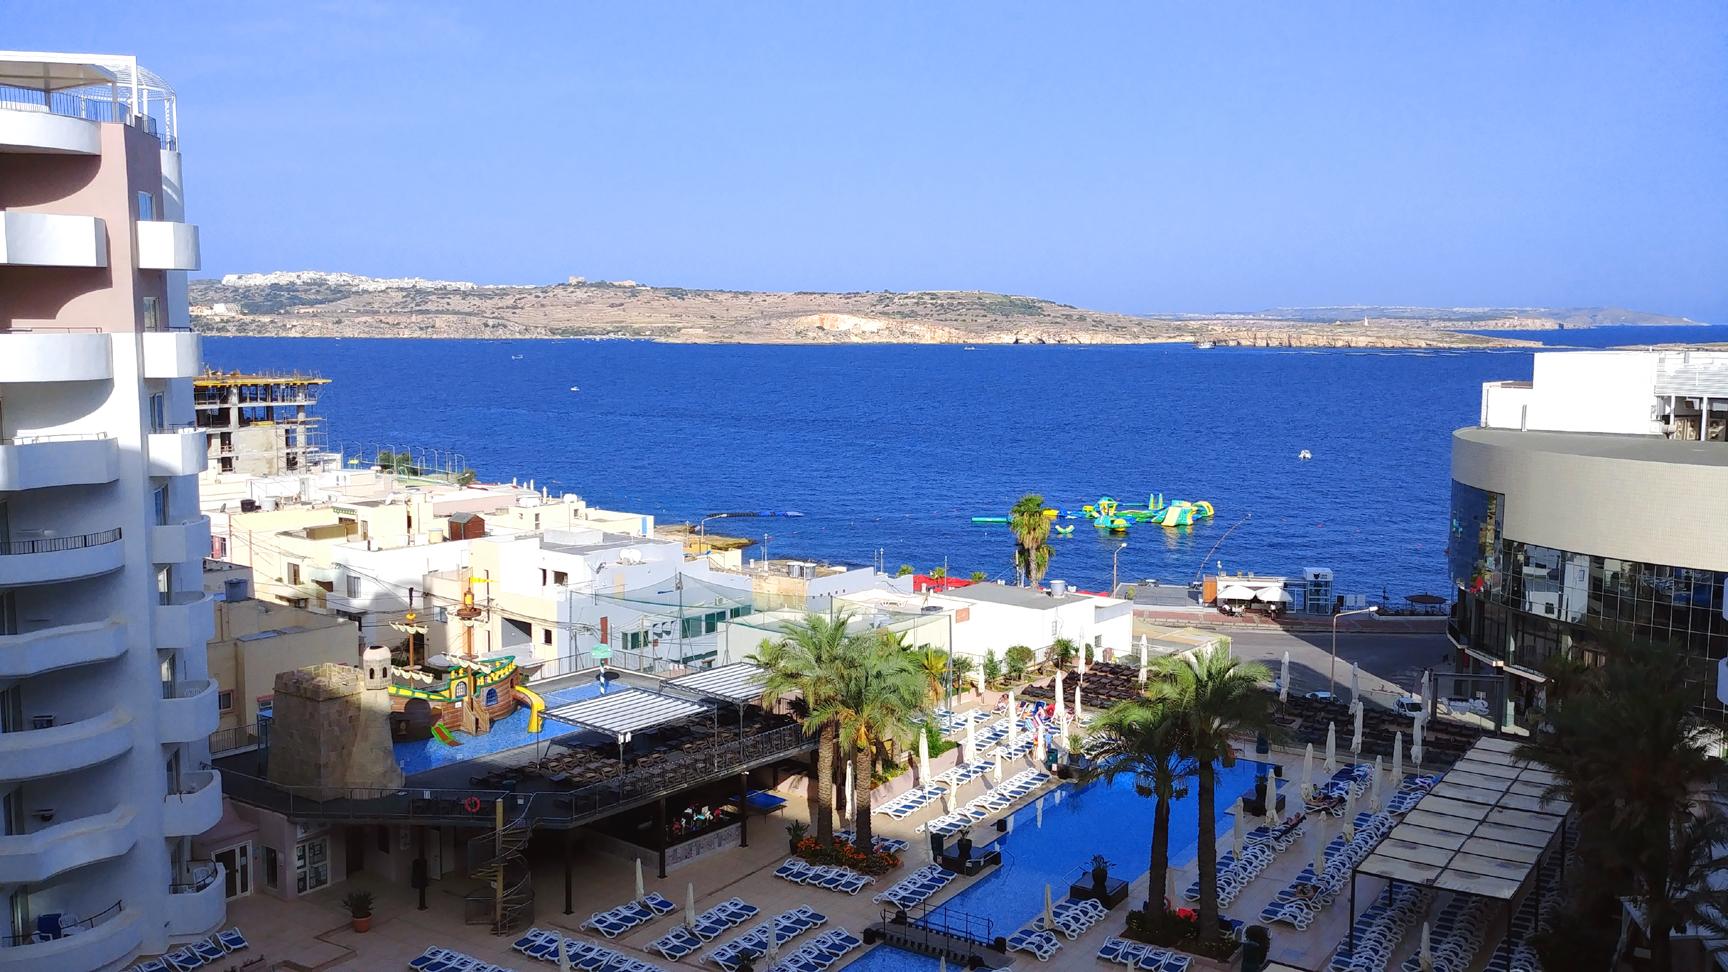 30-Days in Malta - First view